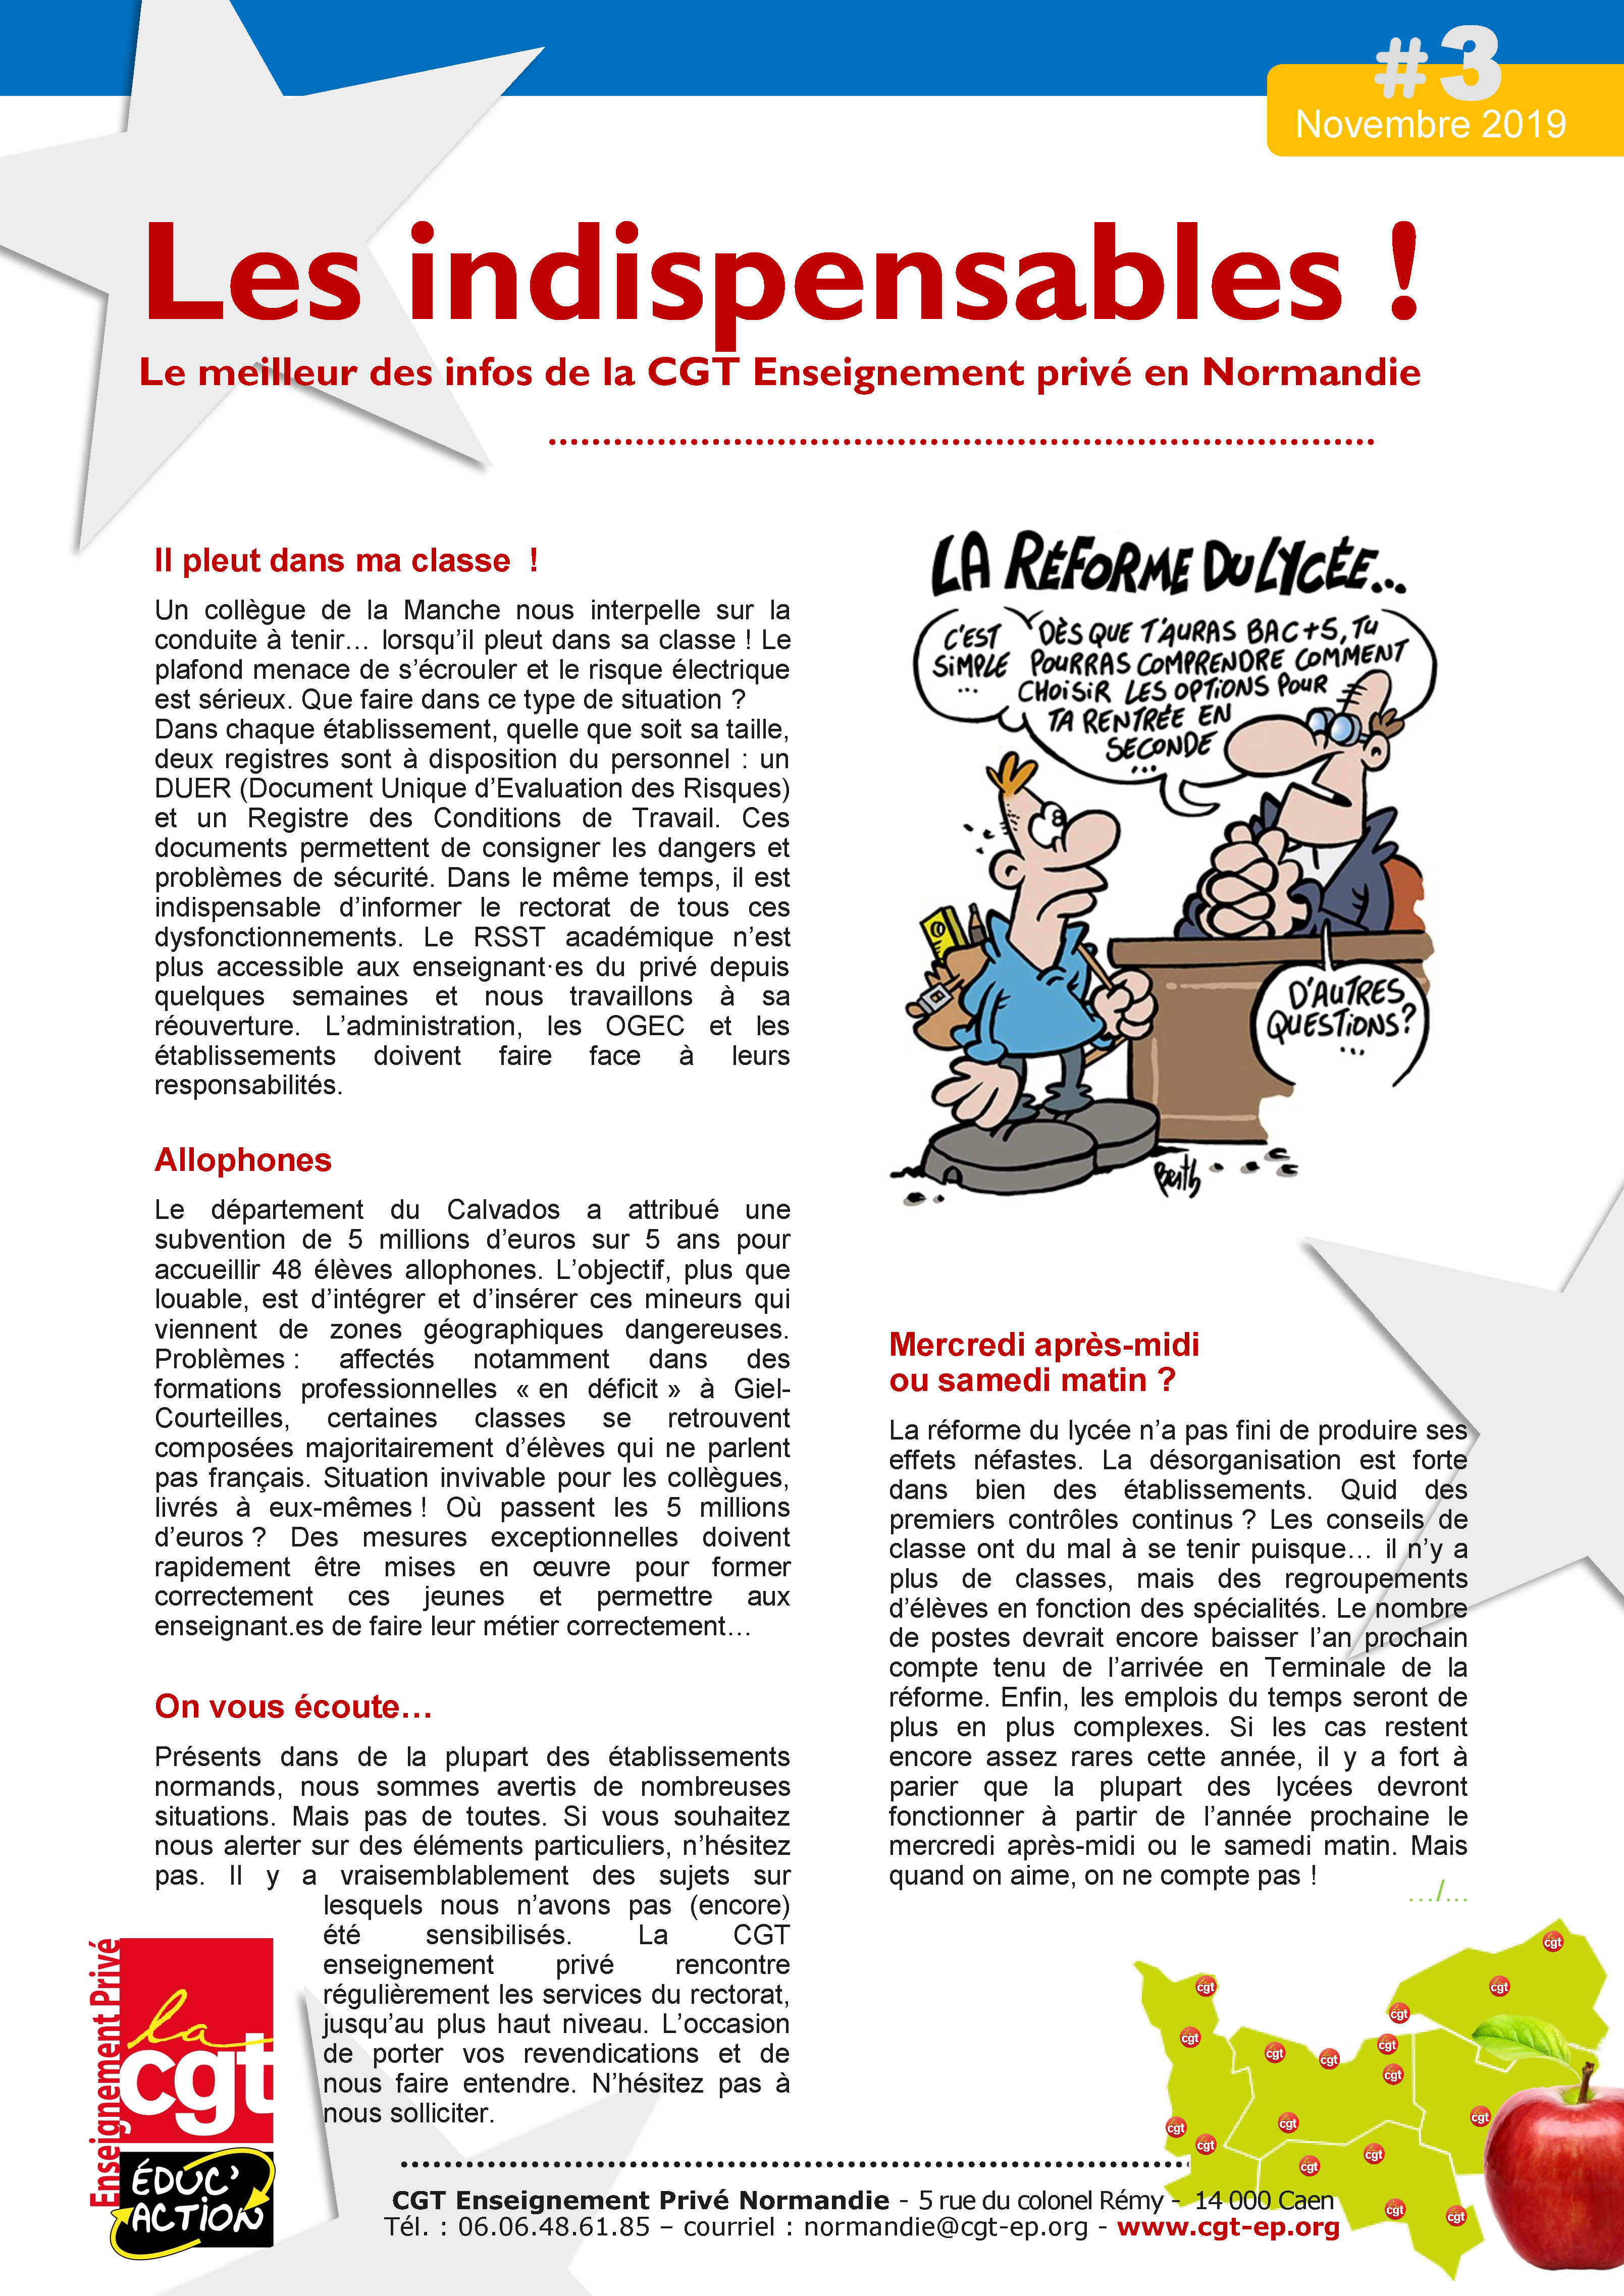 2019-11-10_les indispensables_CGT_Normandie_3_Page_1